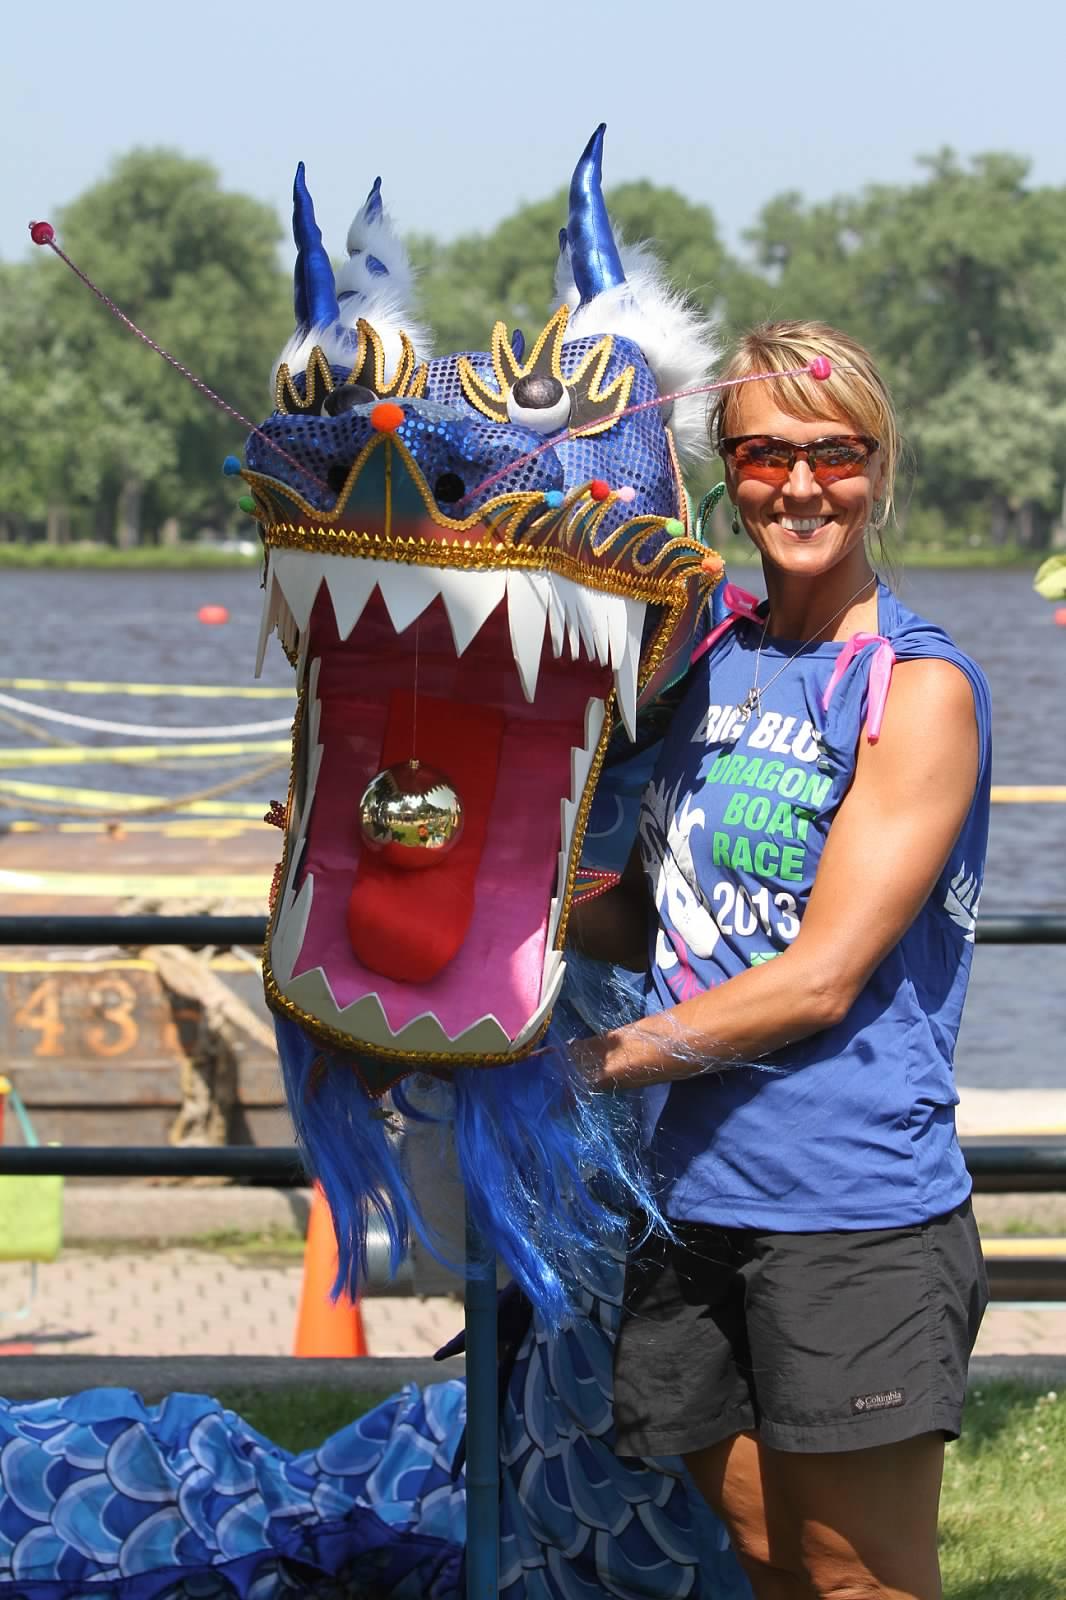 Lacrosse Dragon Boat Racer